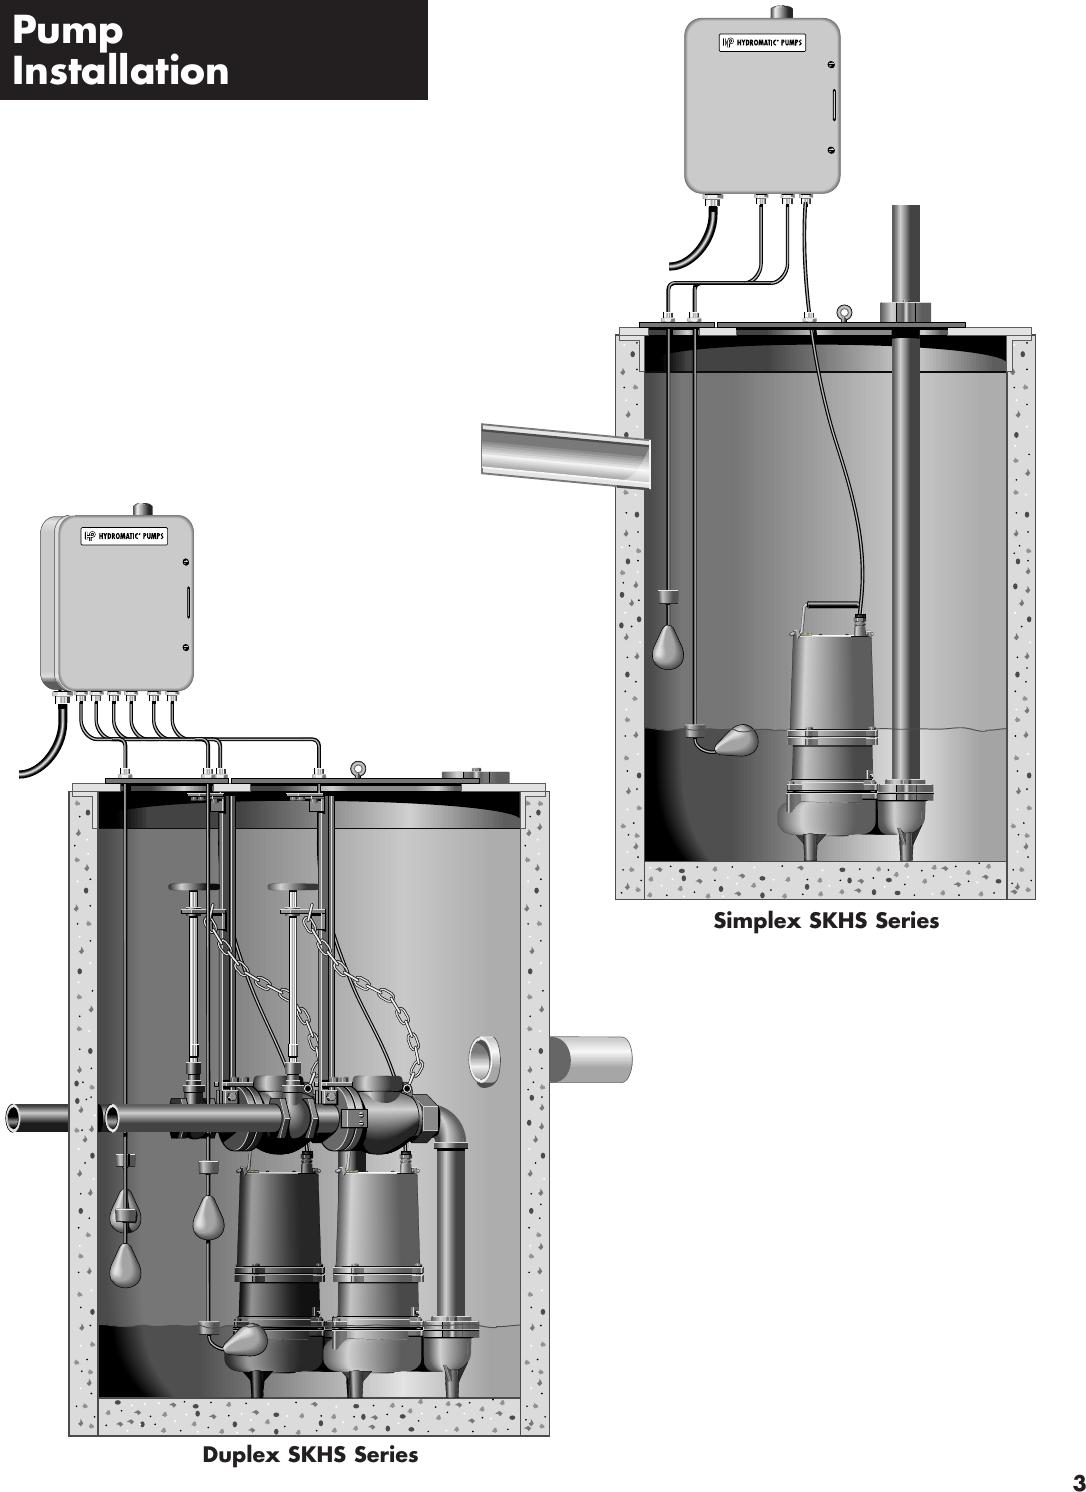 Hydromatic Pump Wiring Diagram - 4 3l Vortec Engine Diagram -  podewiring.yenpancane.jeanjaures37.fr | Hydromatic Pump Wiring Diagram |  | Wiring Diagram Resource